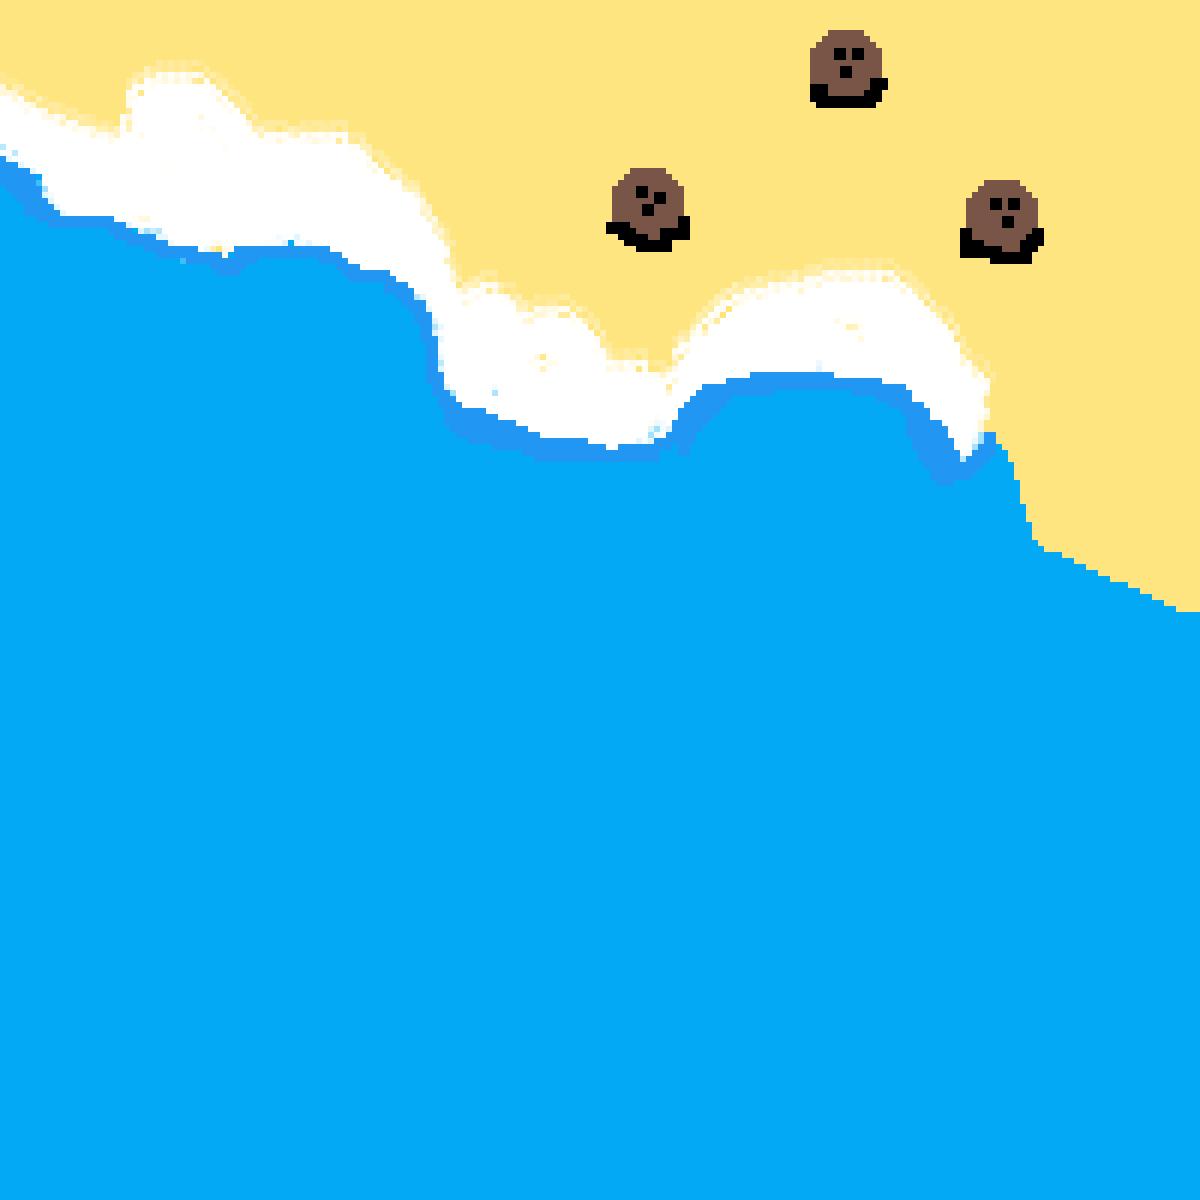 island  by Blade992